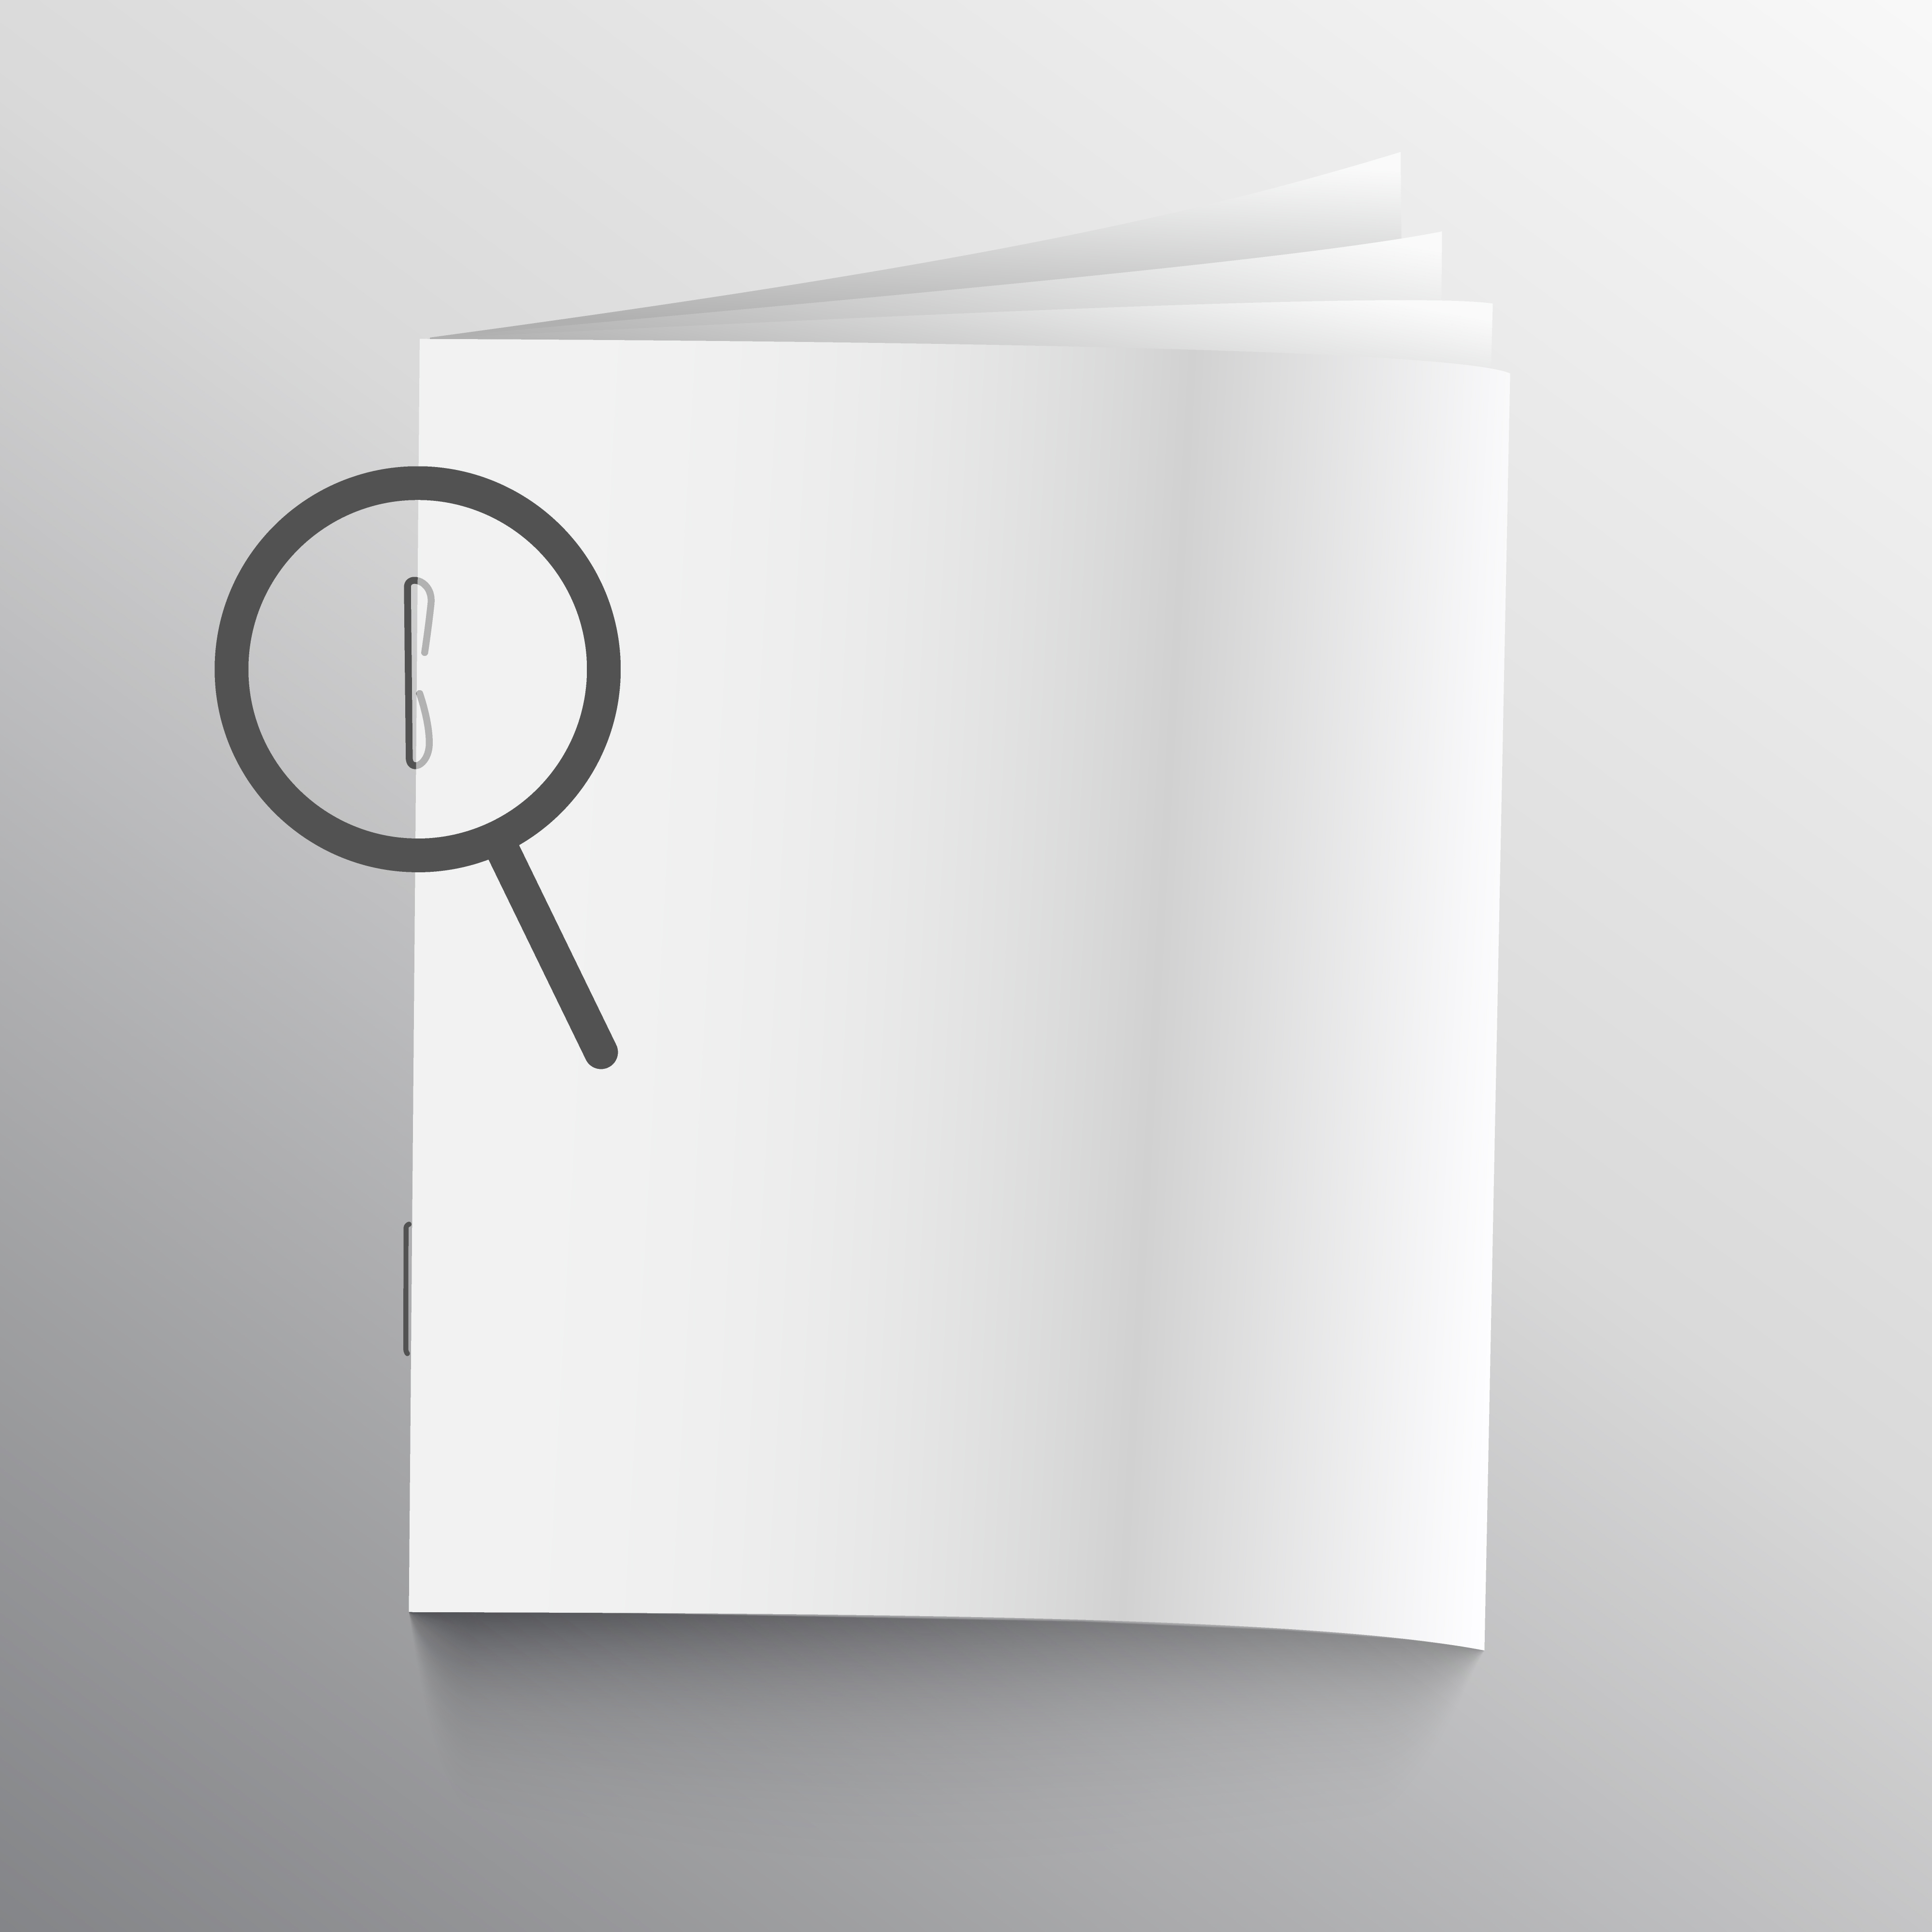 Magazine Mockup Free Vector Art 3151 Free Downloads